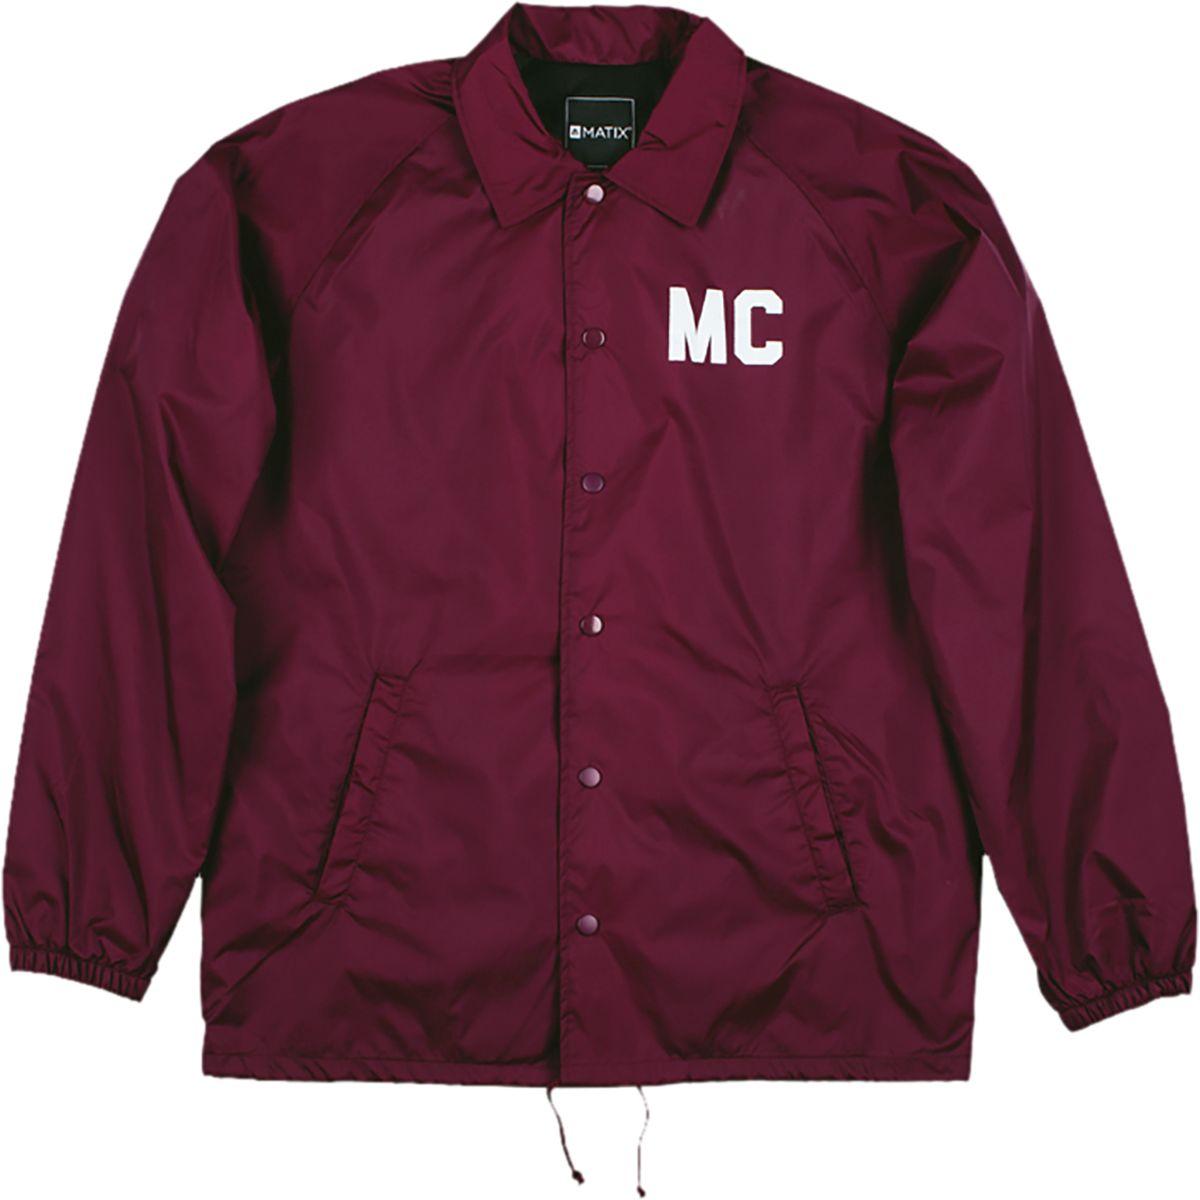 Matix League Coaches Thermal Jacket - Men